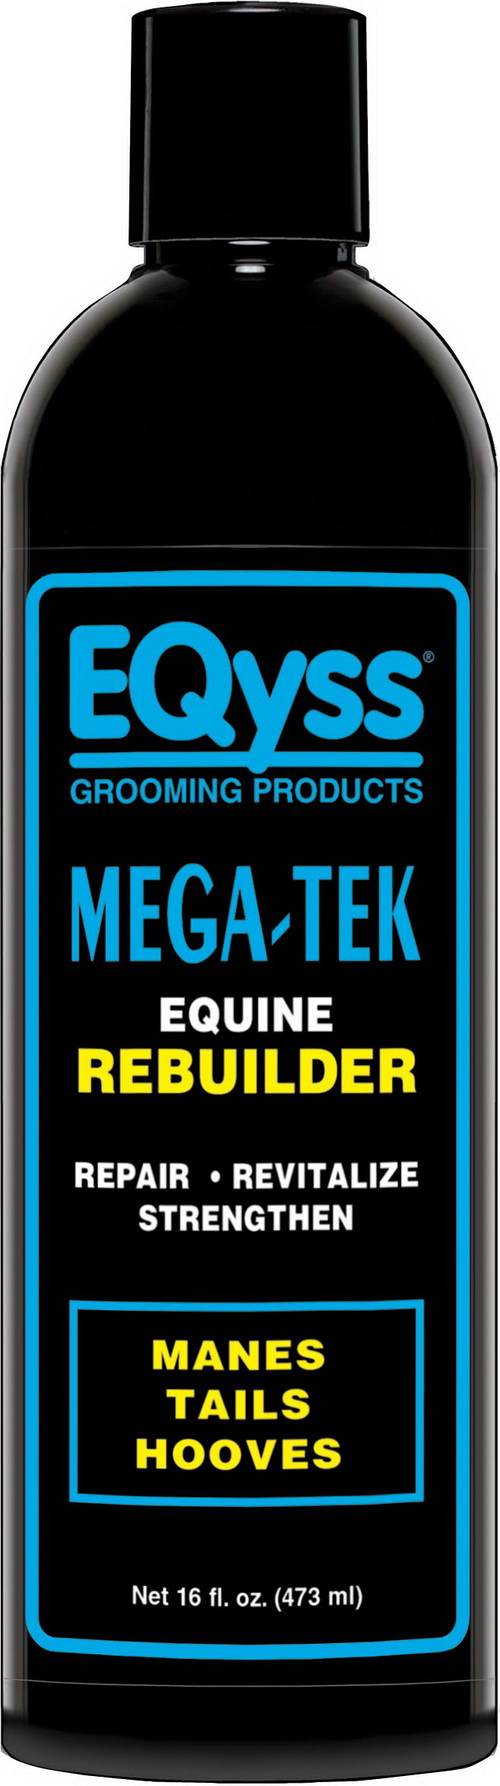 Eqyss Mega-Tek Equine Rebuilder Hoof/Mane/Tail - 16 Ounce